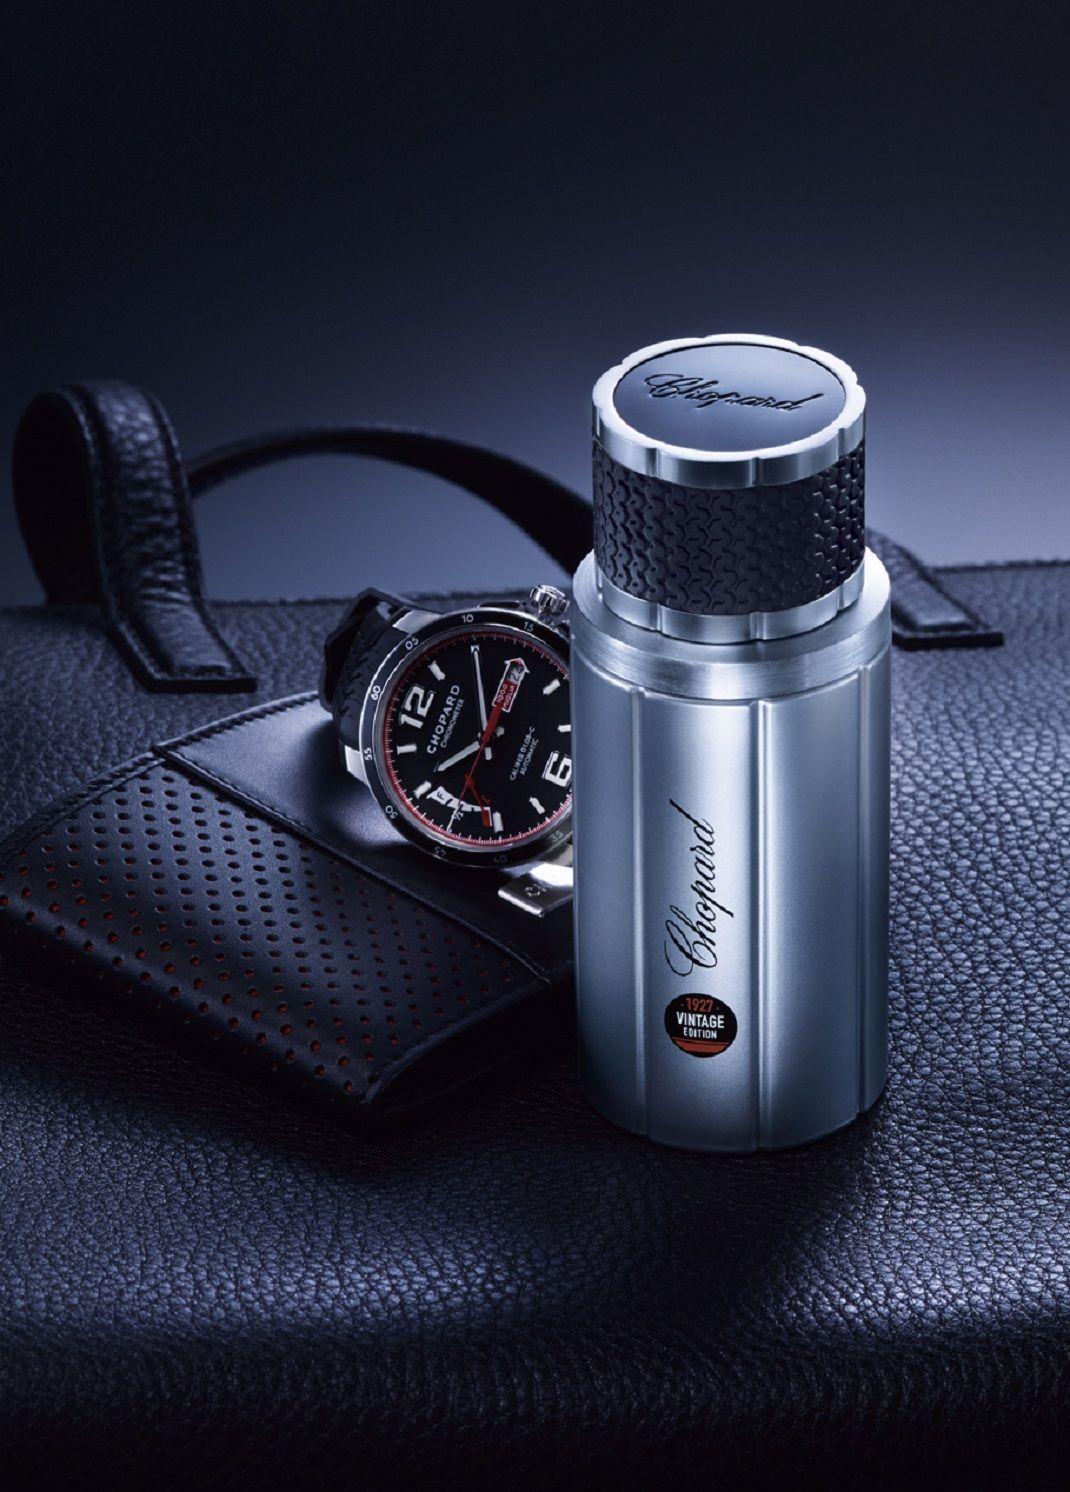 efb37c970 awesome شوبار فينتاج إديشن..عطر مميز للرجل الراقي   Men Perfumes ...